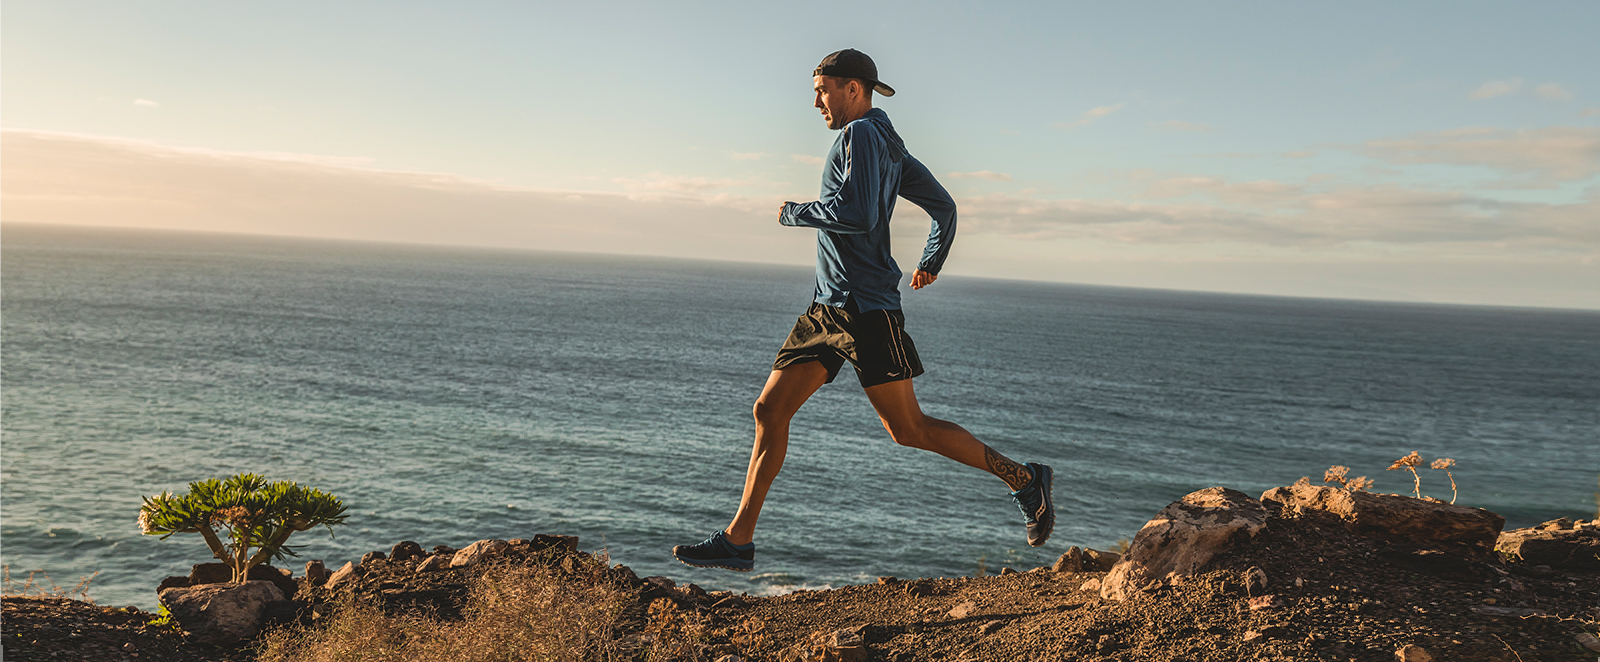 A man running along rocks